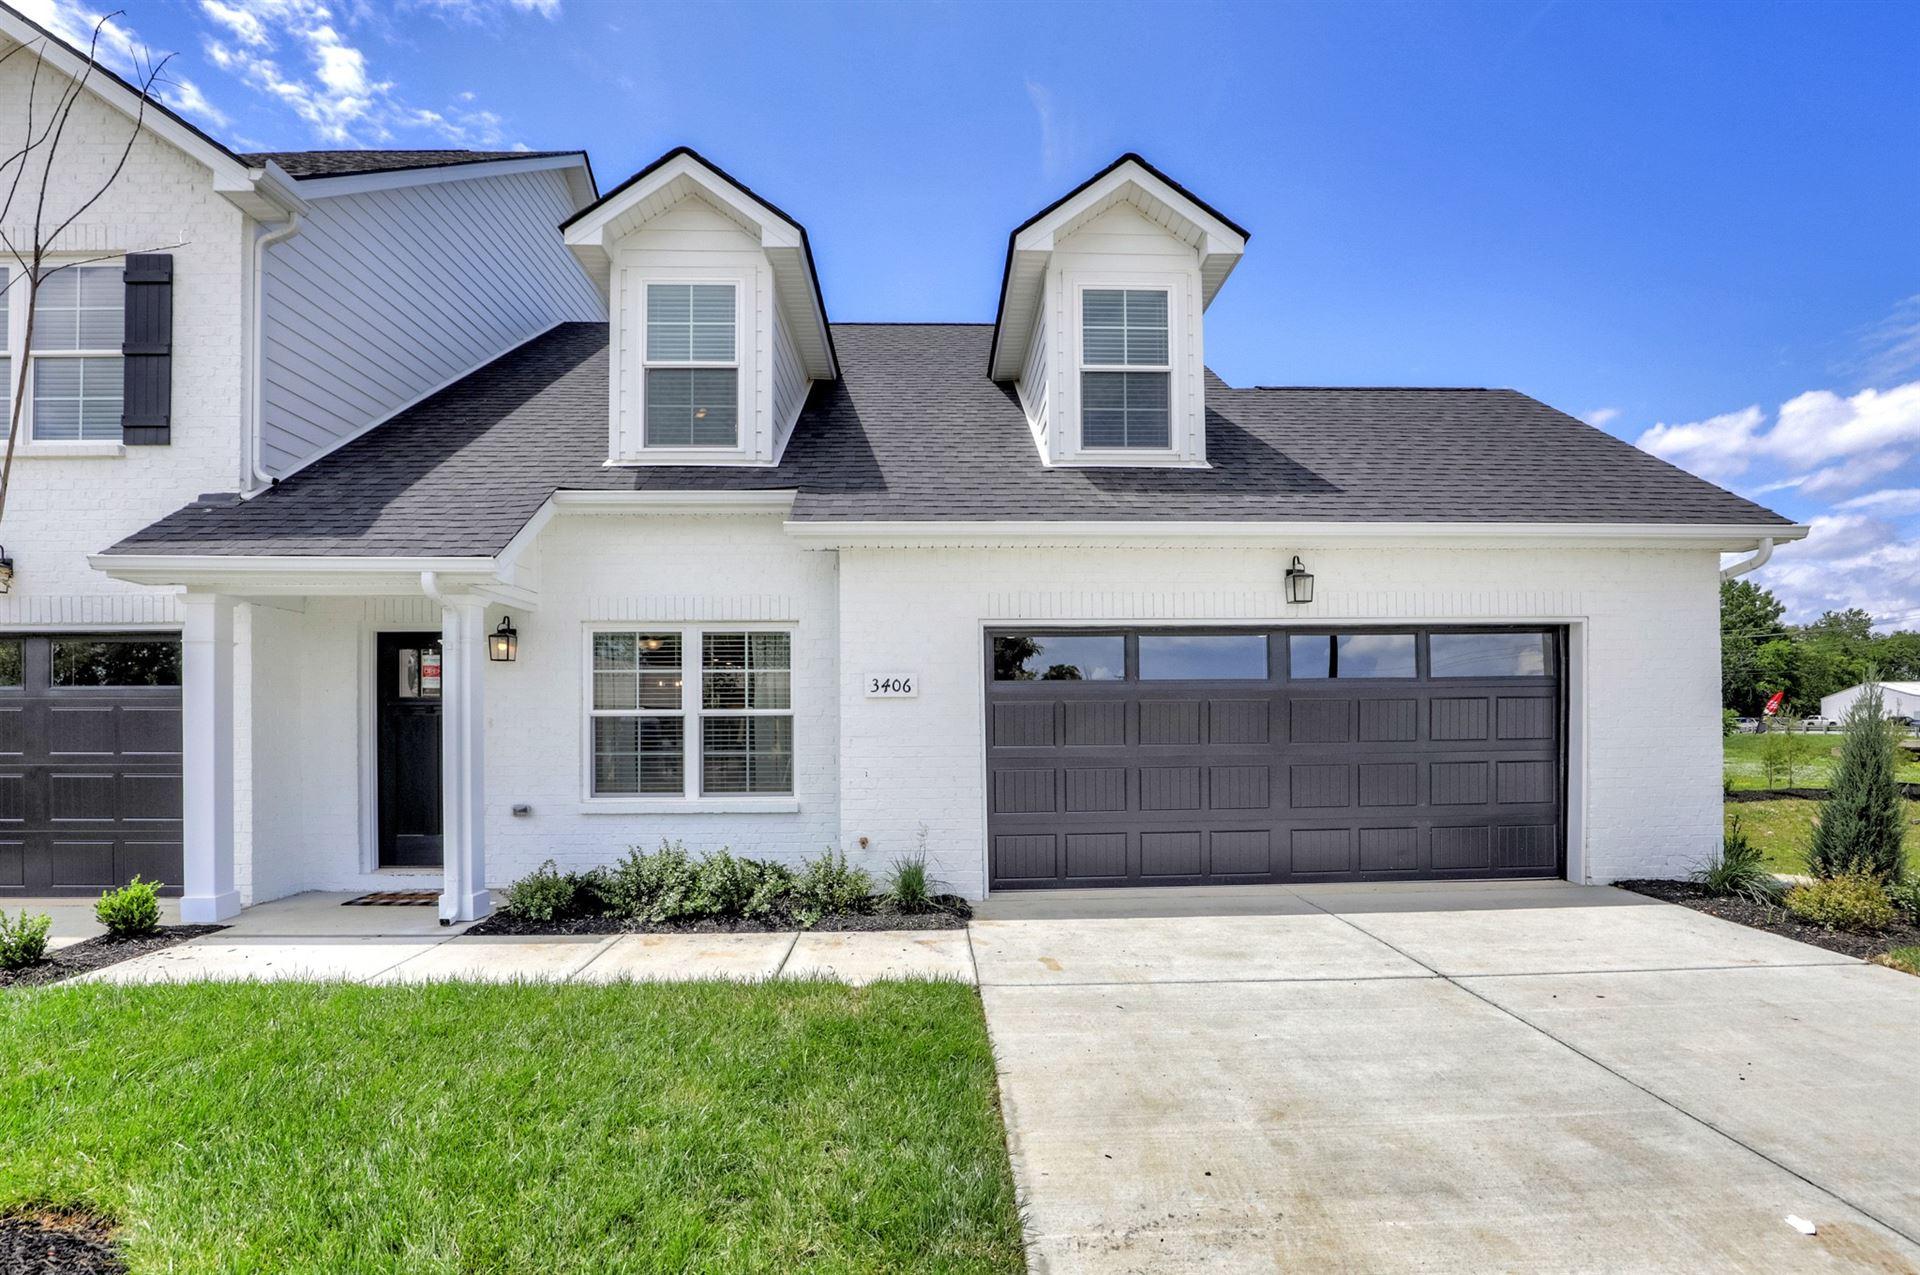 3406 Learning Lane, Murfreesboro, TN 37128 - MLS#: 2148418